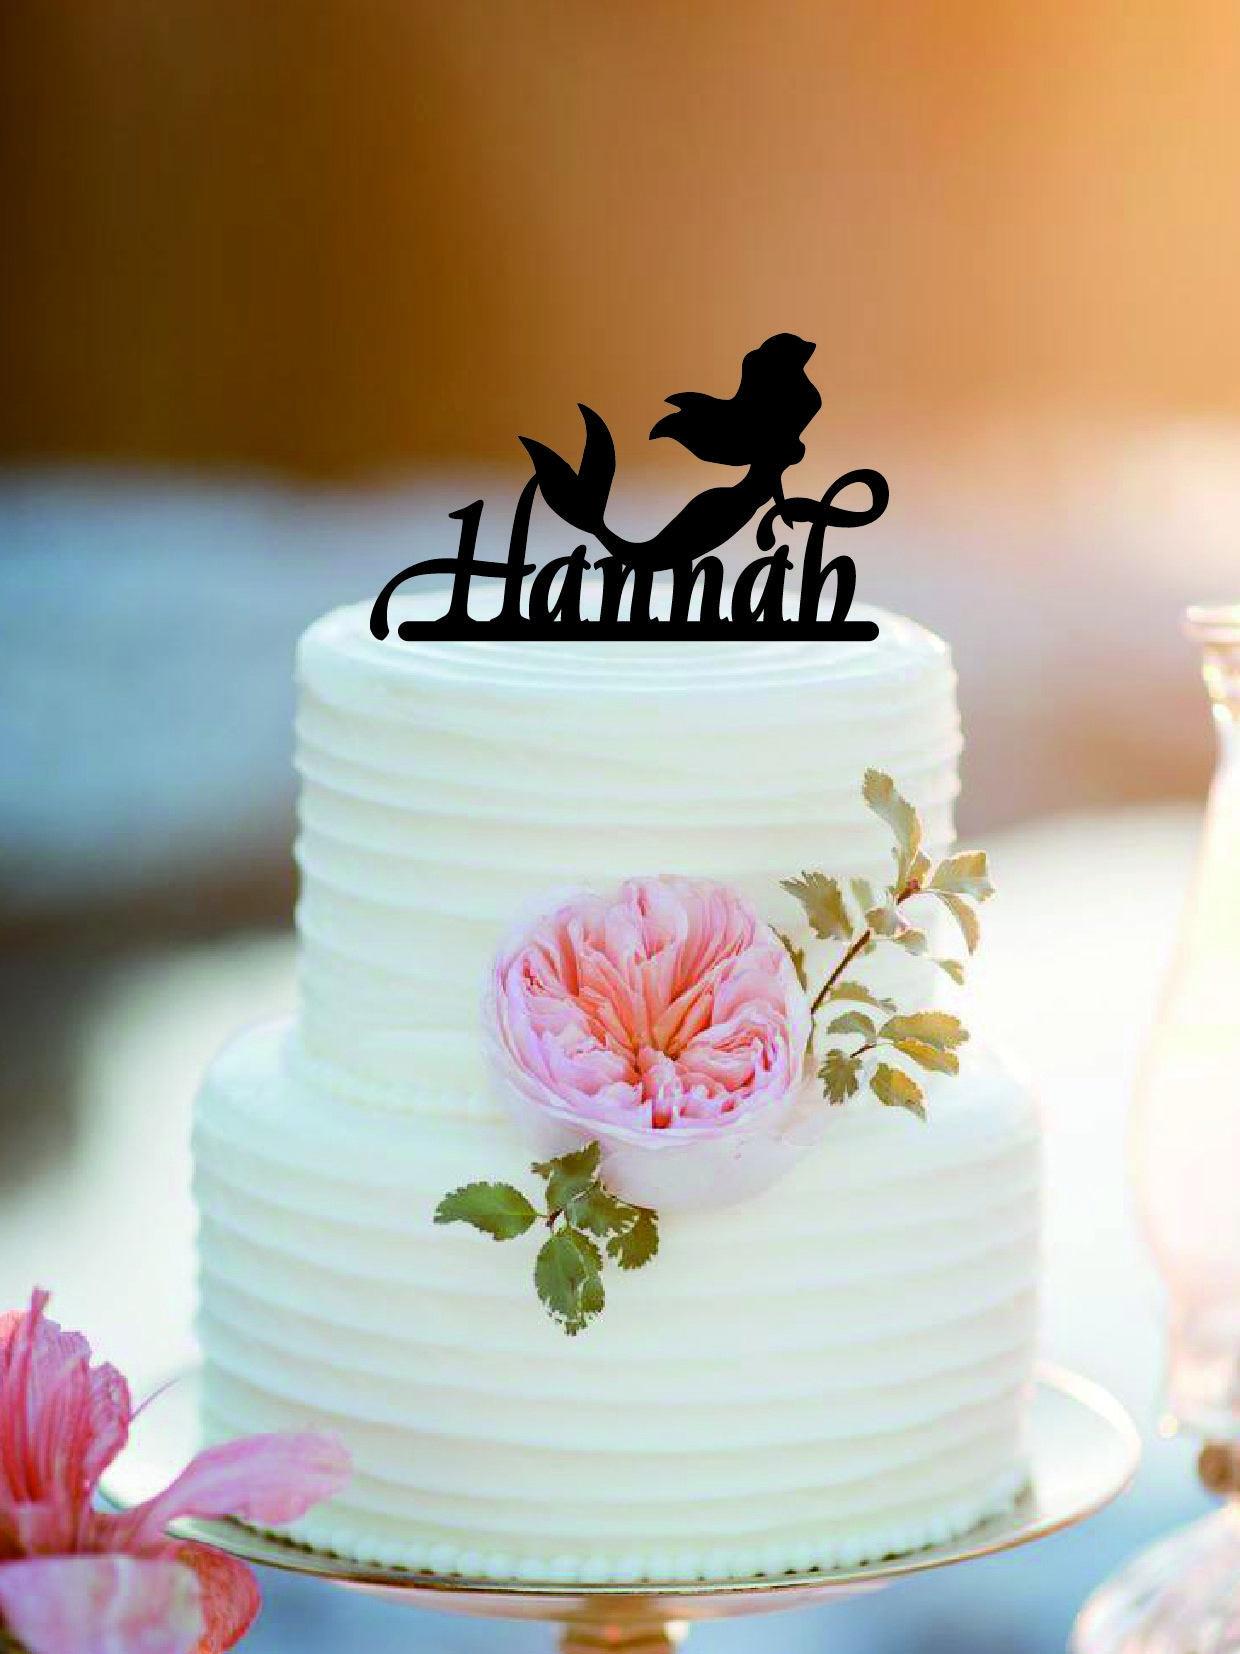 Mermaid with name Birthday Cake Topper /Bithday Cake Topper